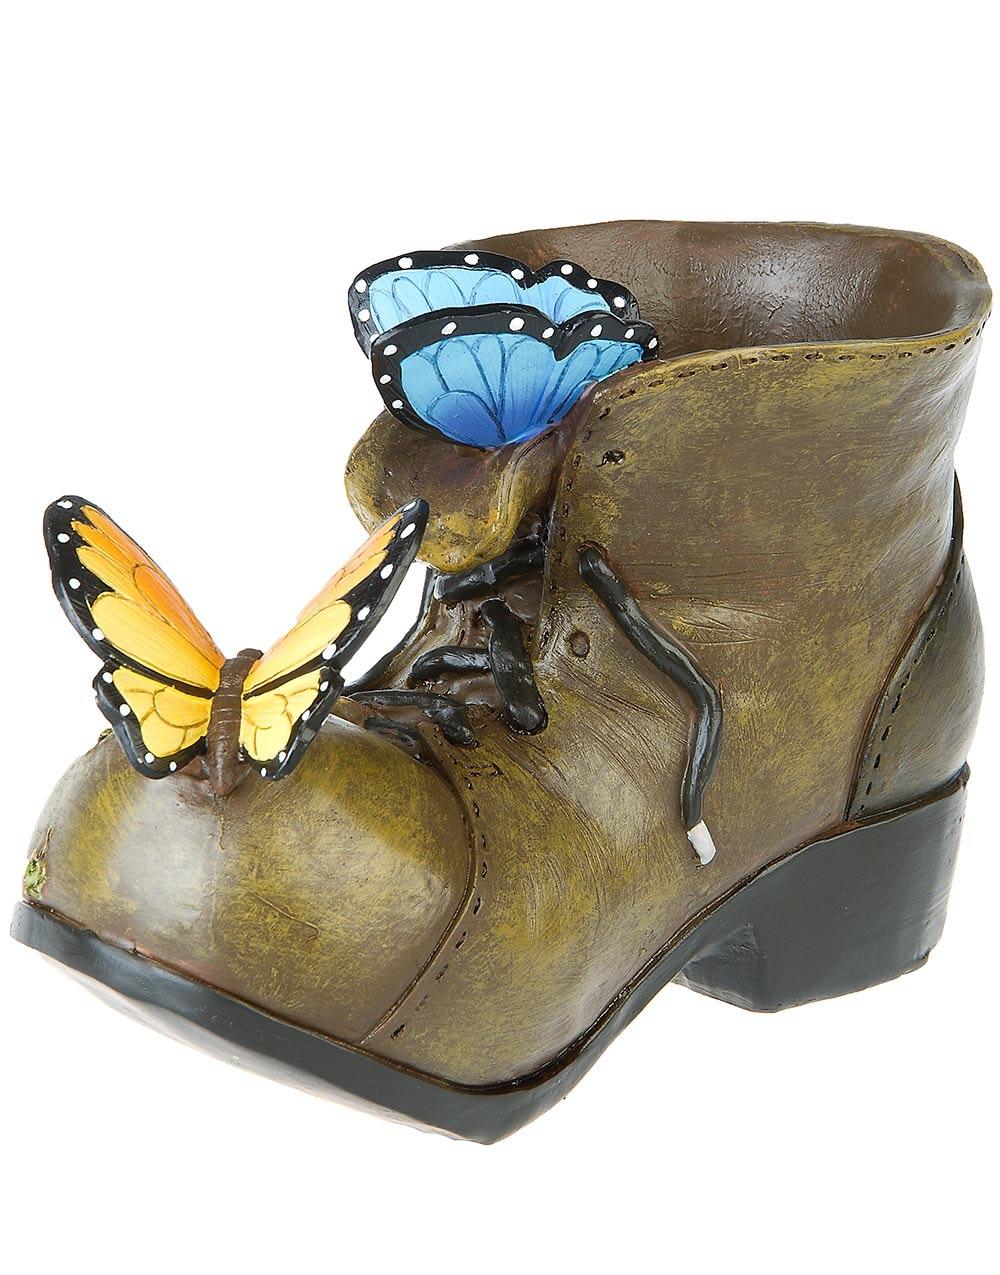 sex leketøy butterfly jack kanin sex leketøy